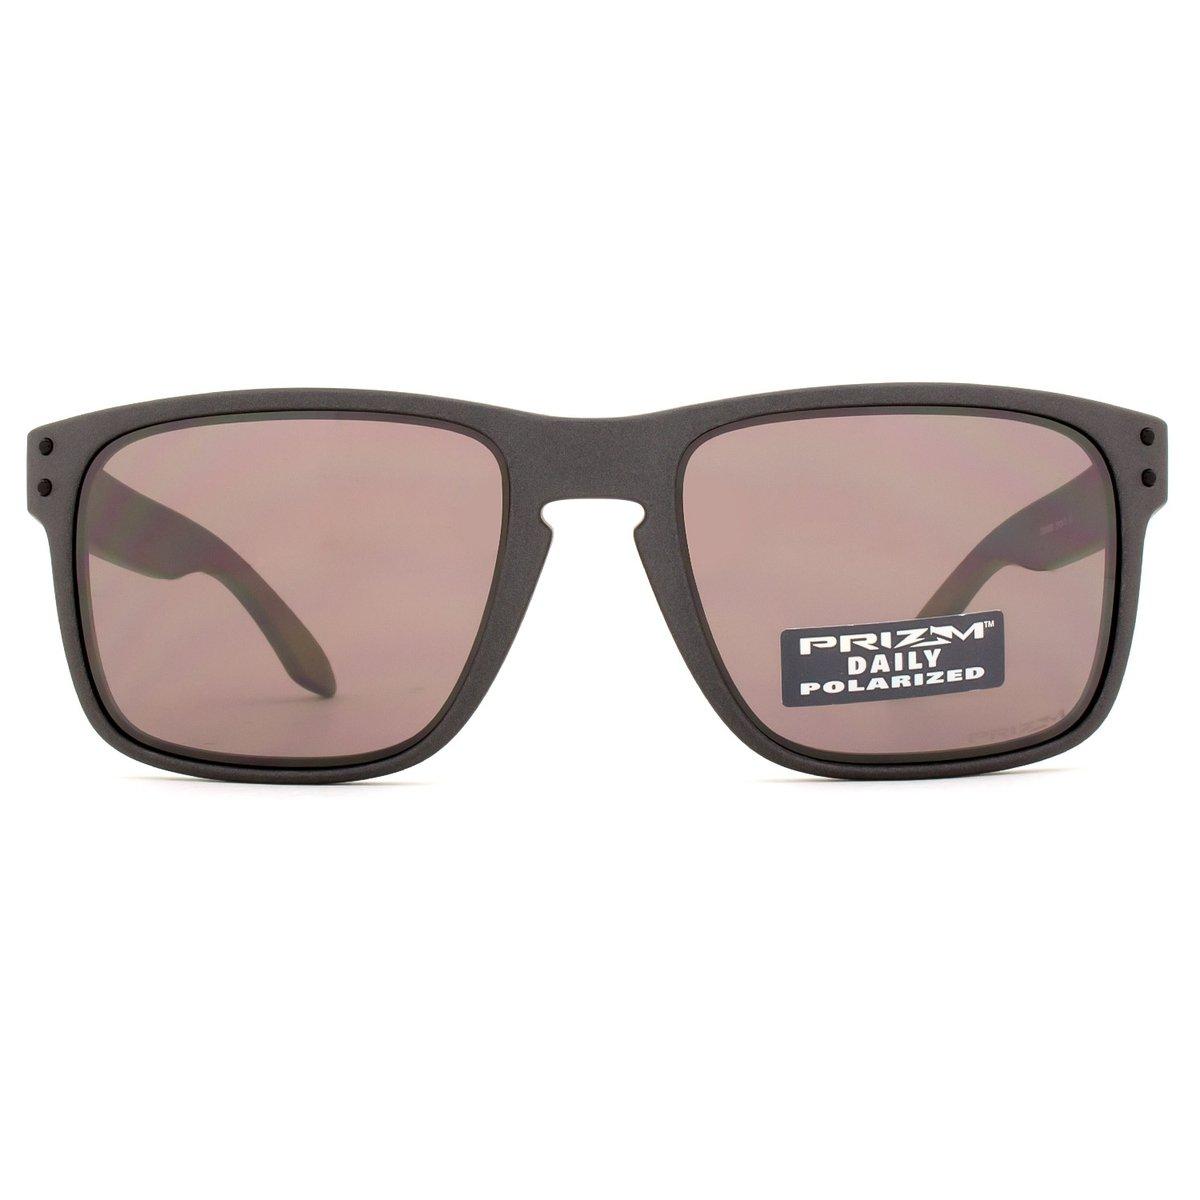 0fab6c12061cb Óculos de Sol Oakley Holbrook Polarizado OO9102 B5-55 Masculino ...